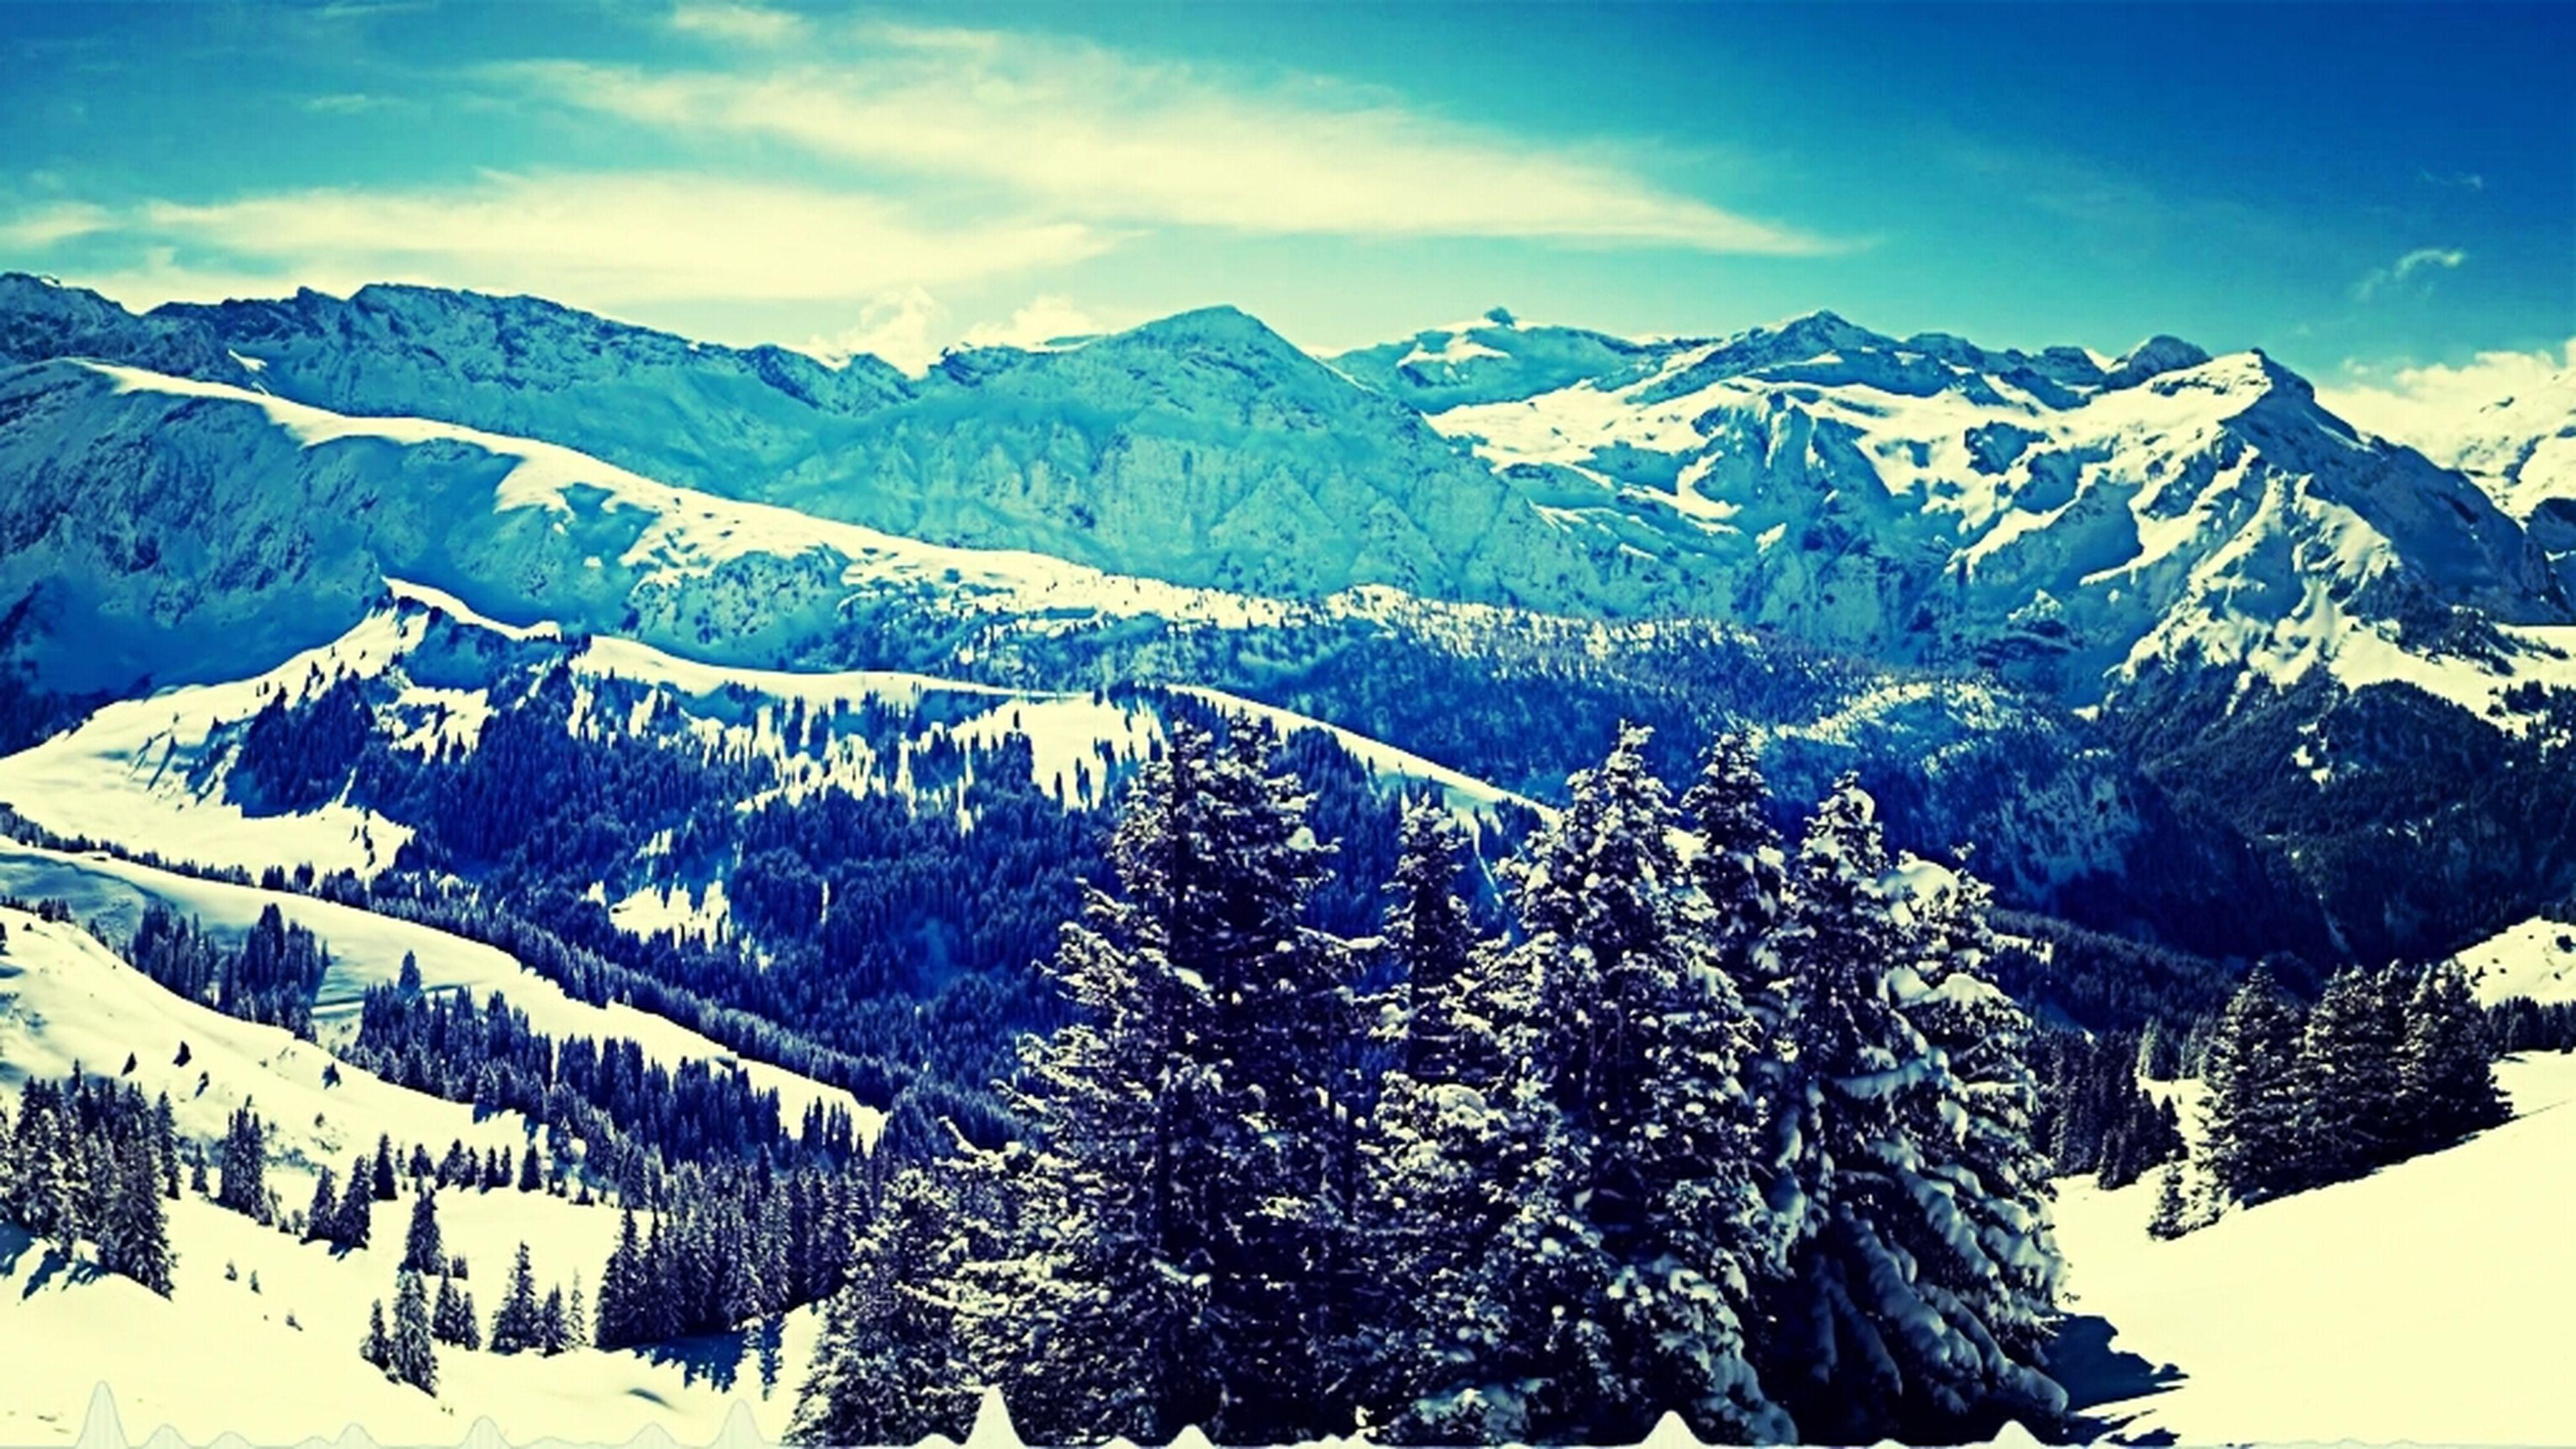 Snow Enjoying Life Awesome Natural Snowboarding Fresh Produce DOPE #sunset #sun #clouds #skylovers #sky #nature #beautifulinnature #naturalbeauty #photography #landscape Fresh Well Damn